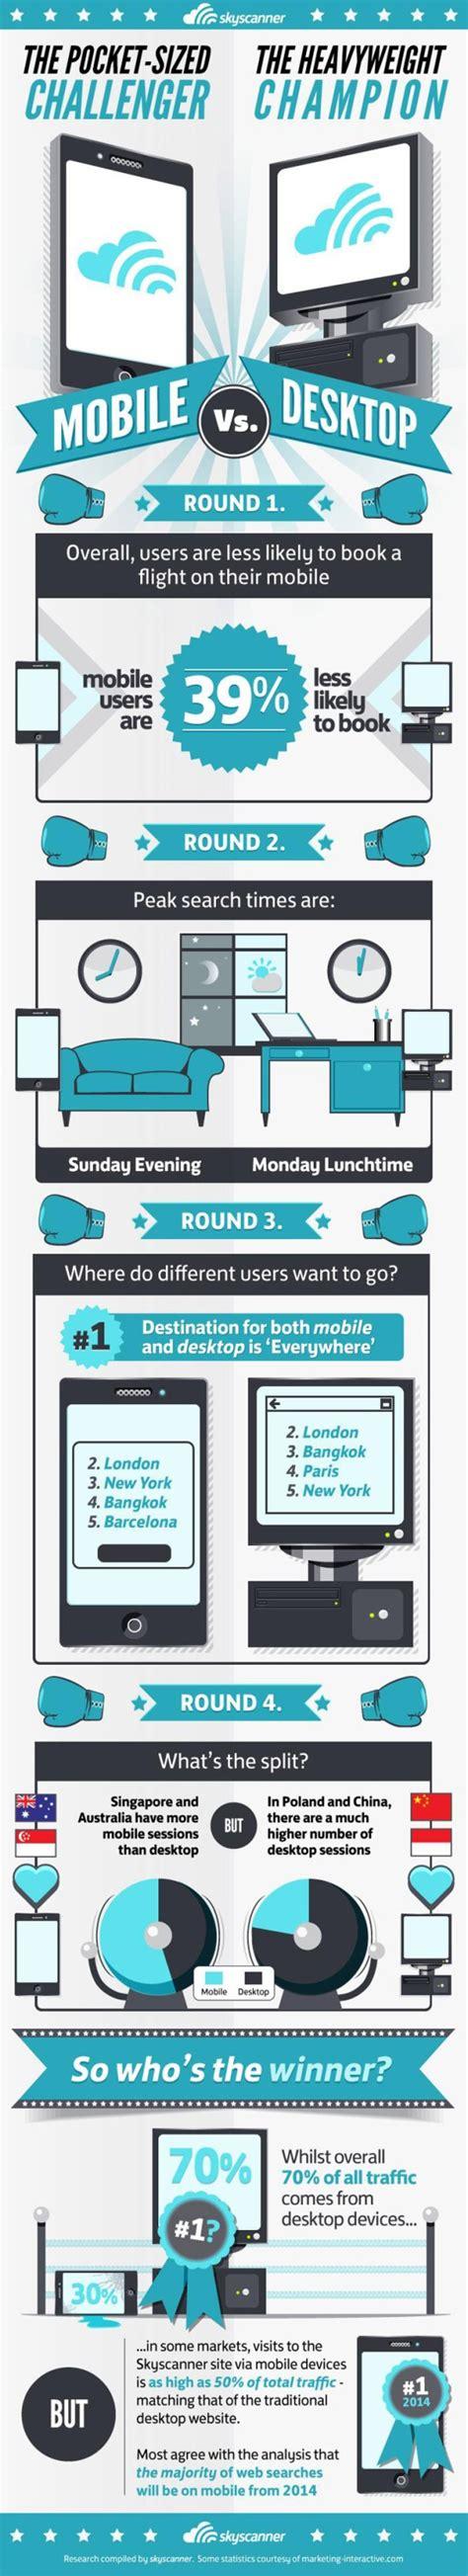 skyscanner mobile website desktop versus mobile behaviour in travel search